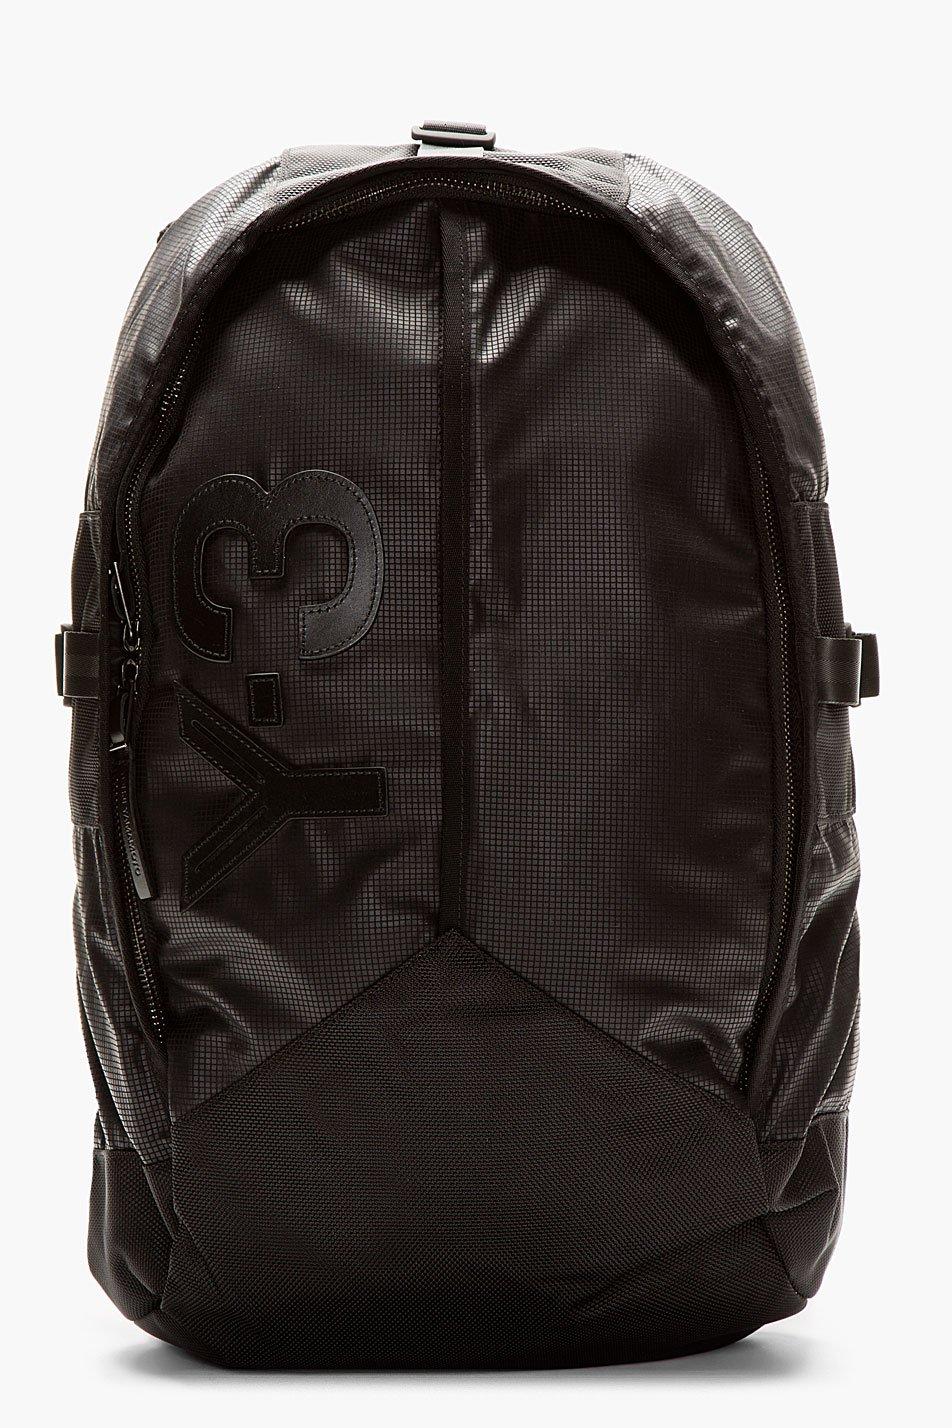 y_3 black graph print mesh_back backpack